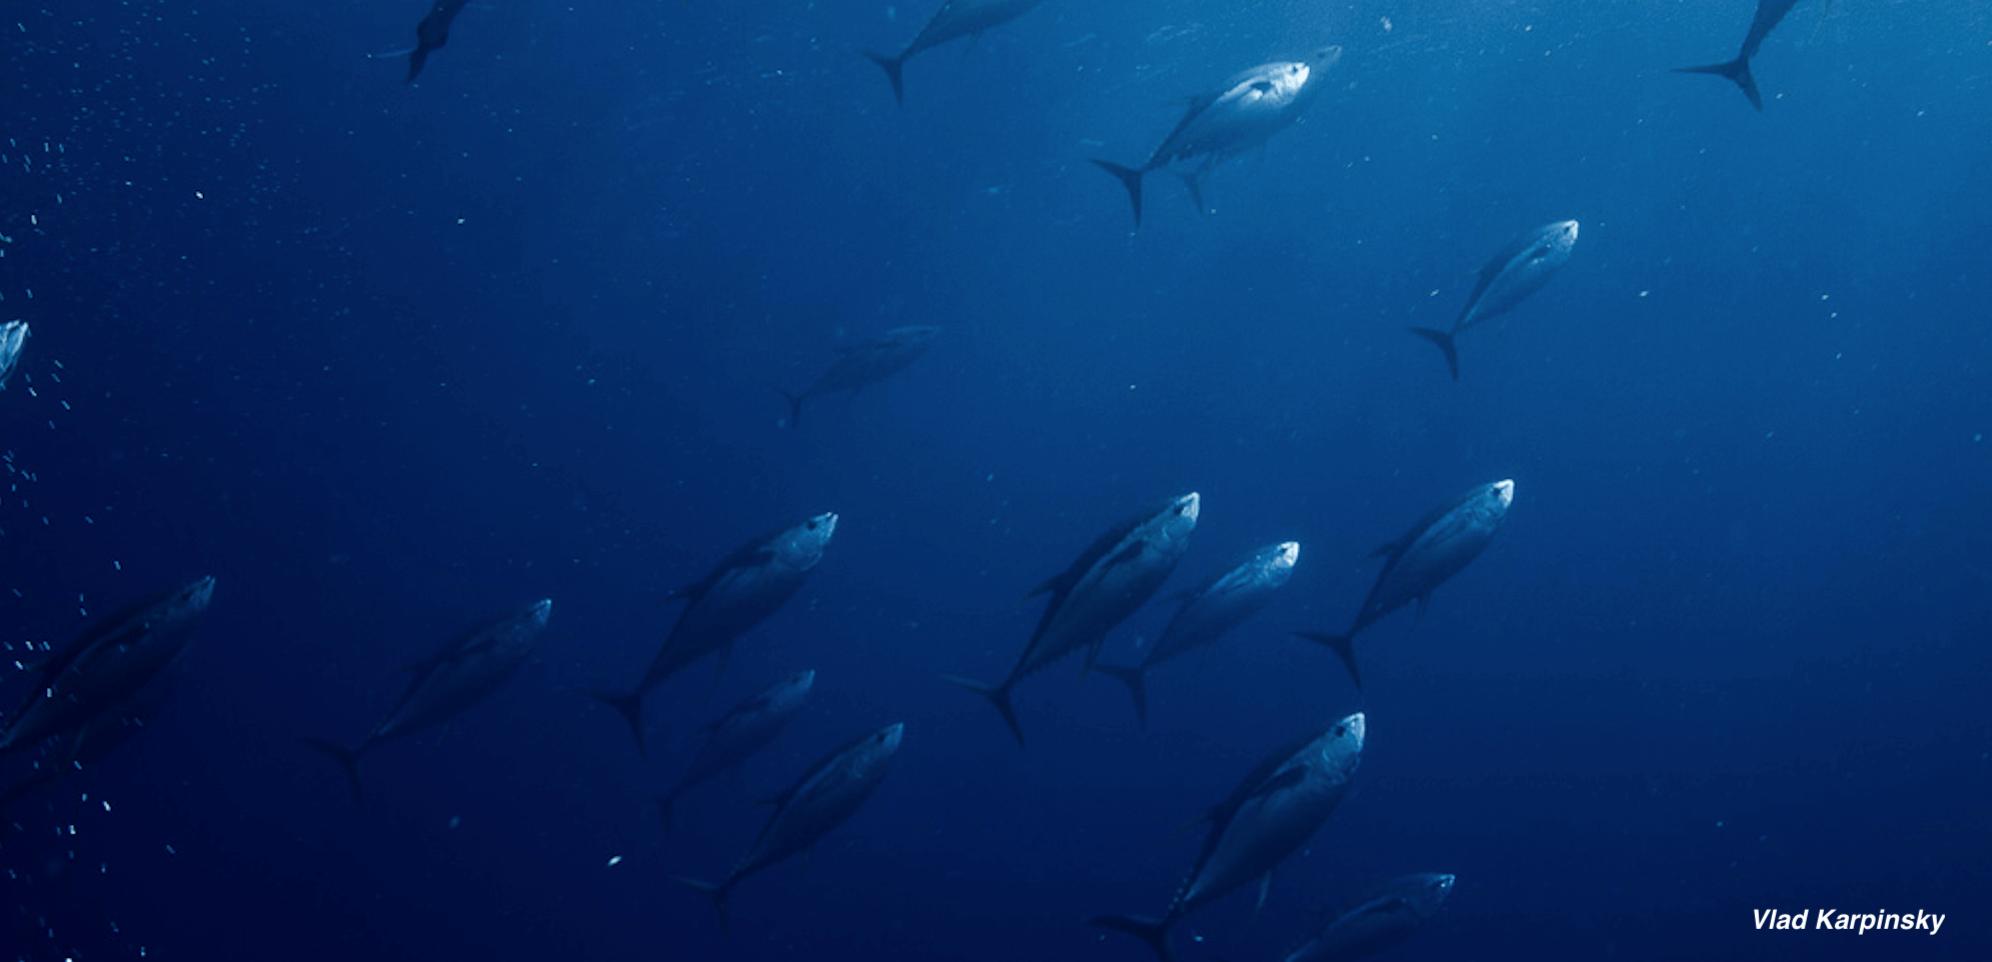 European Parliament Members Discuss Future of Fisheries Management